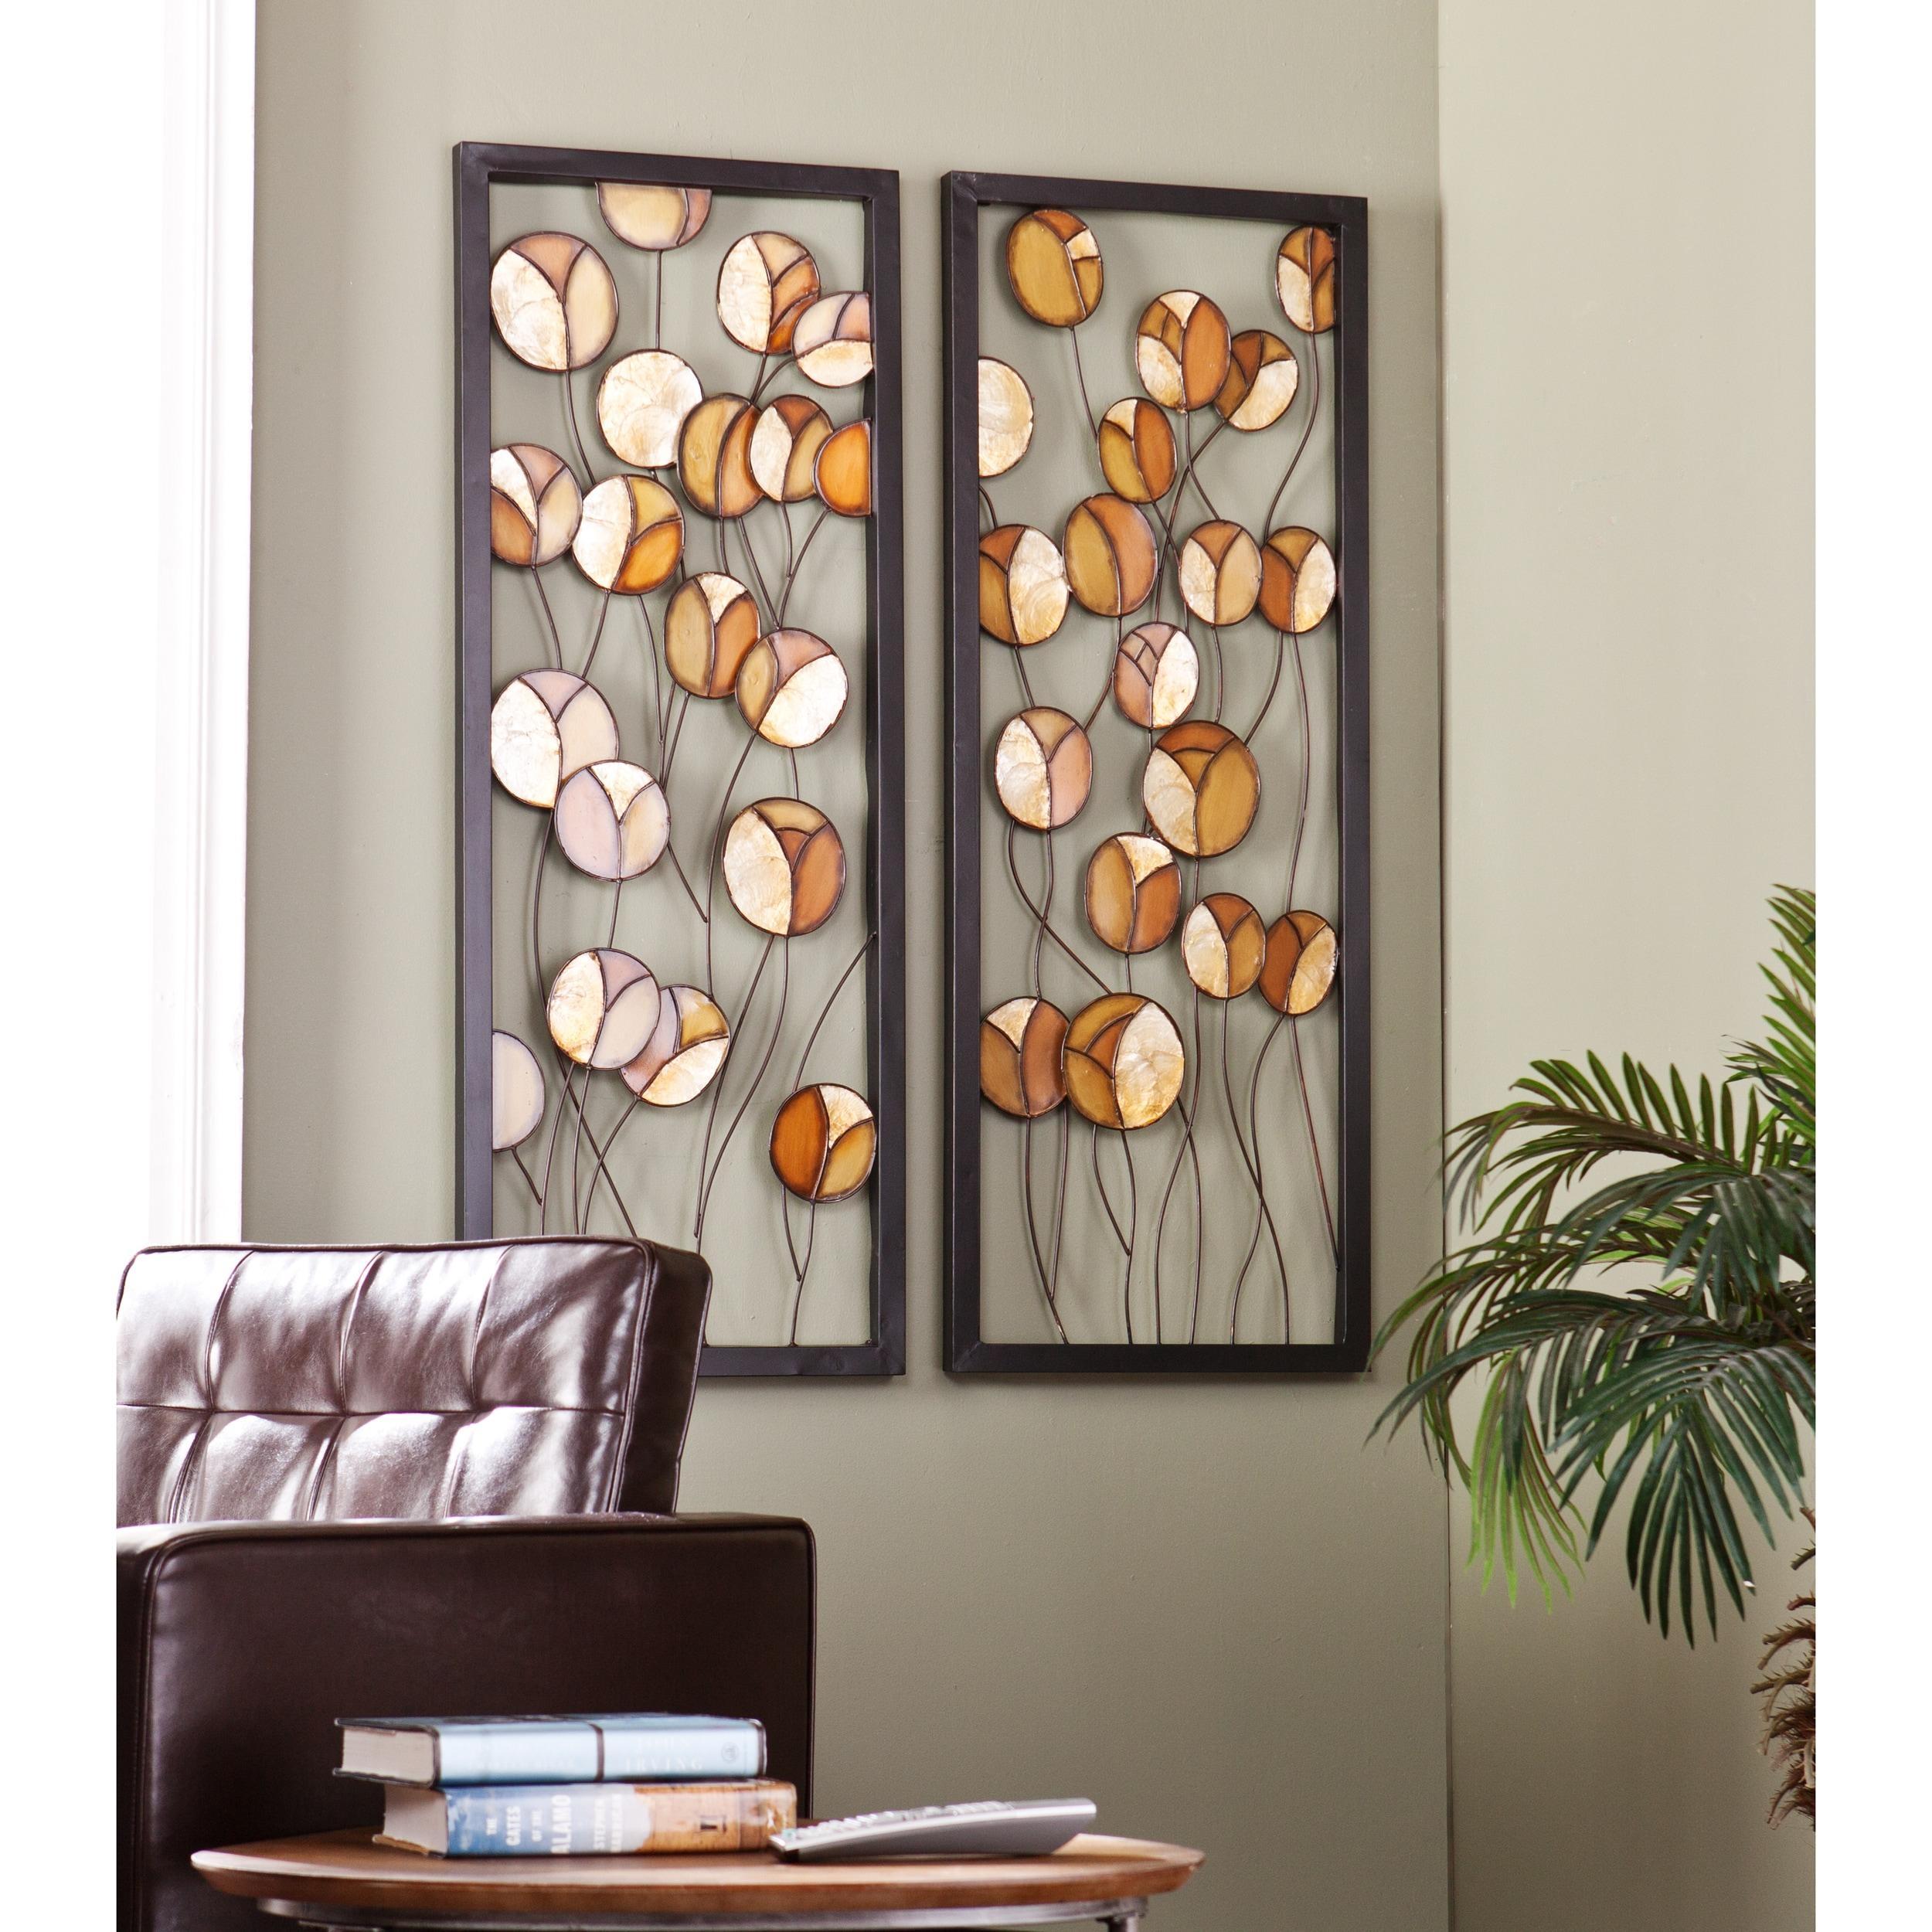 Home Goods Wall Decor: 20 Collection Of Capiz Wall Art